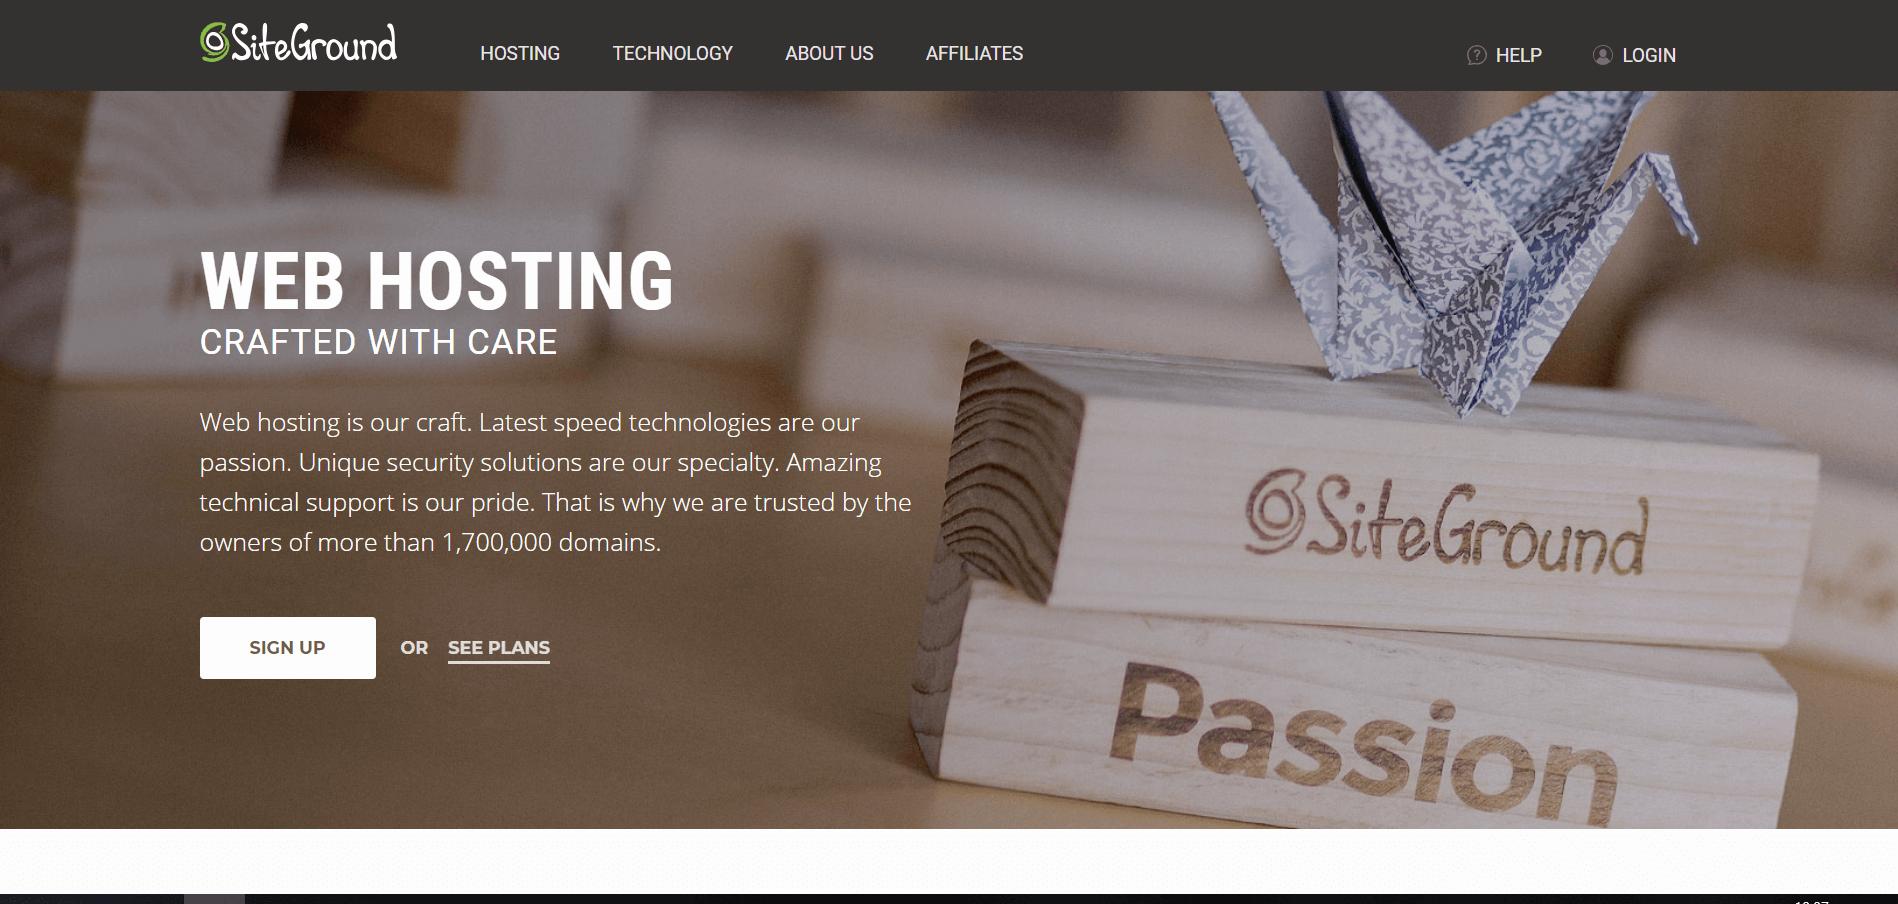 siteground hosting services